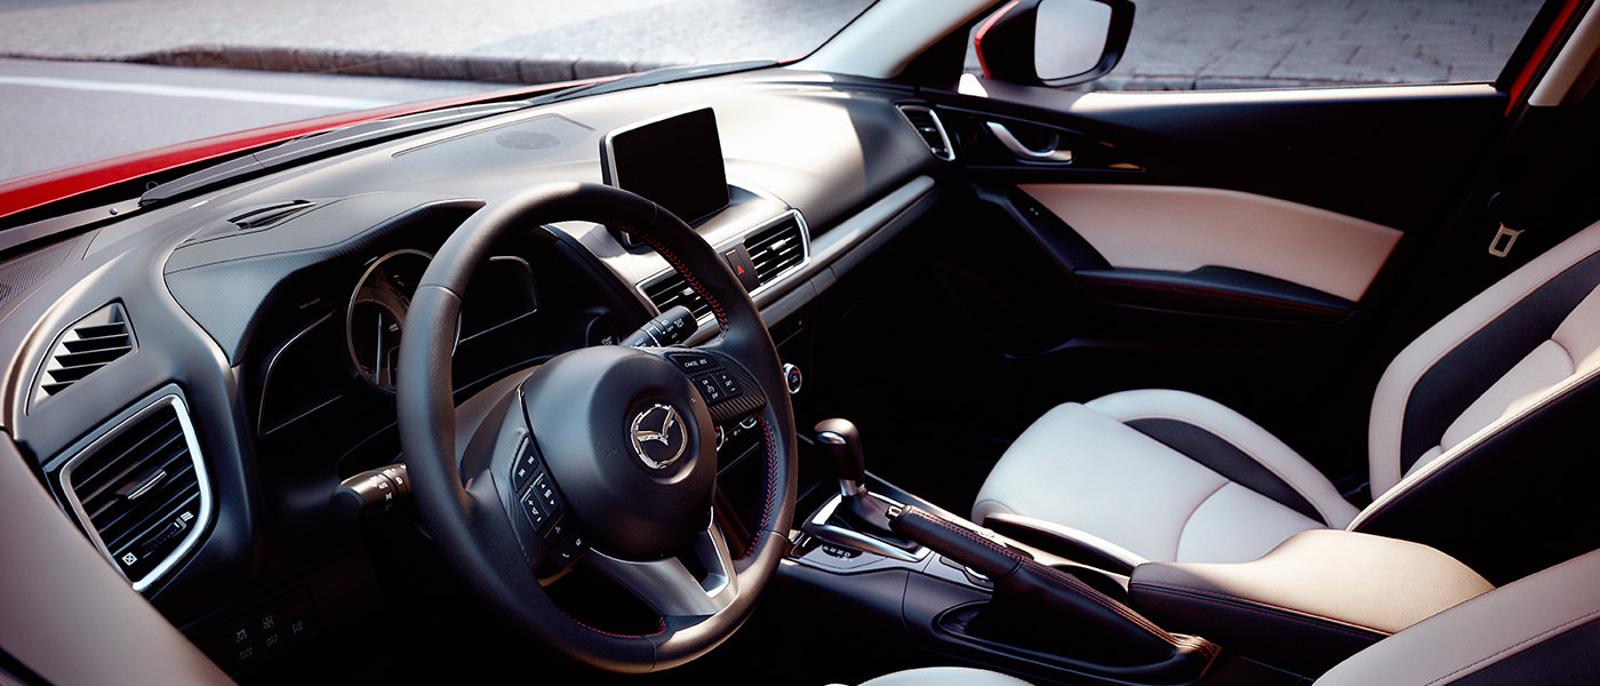 2016 Mazda3 5dr Interior